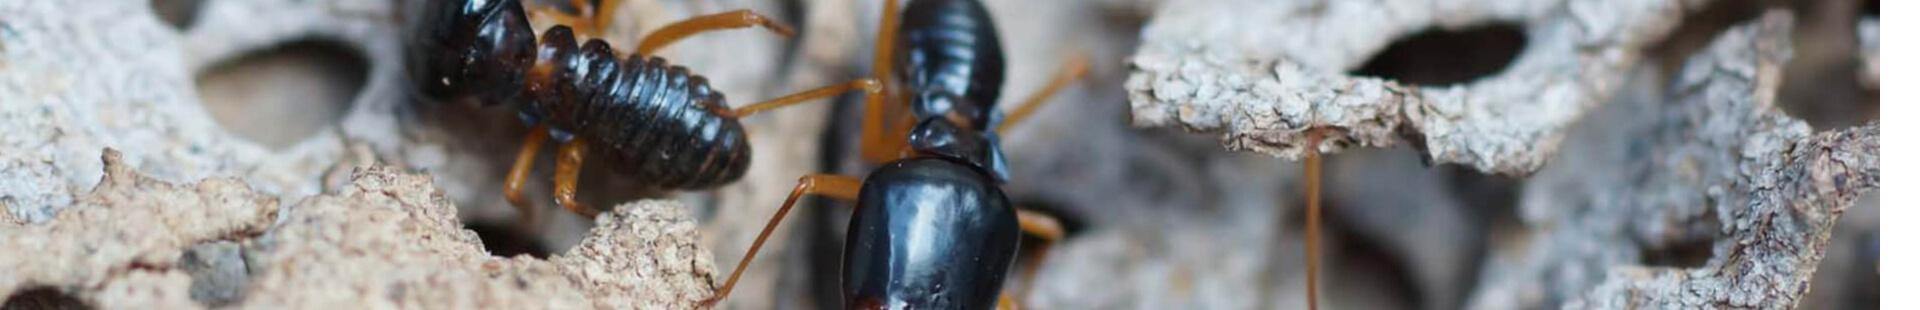 Termite Treatments Banner